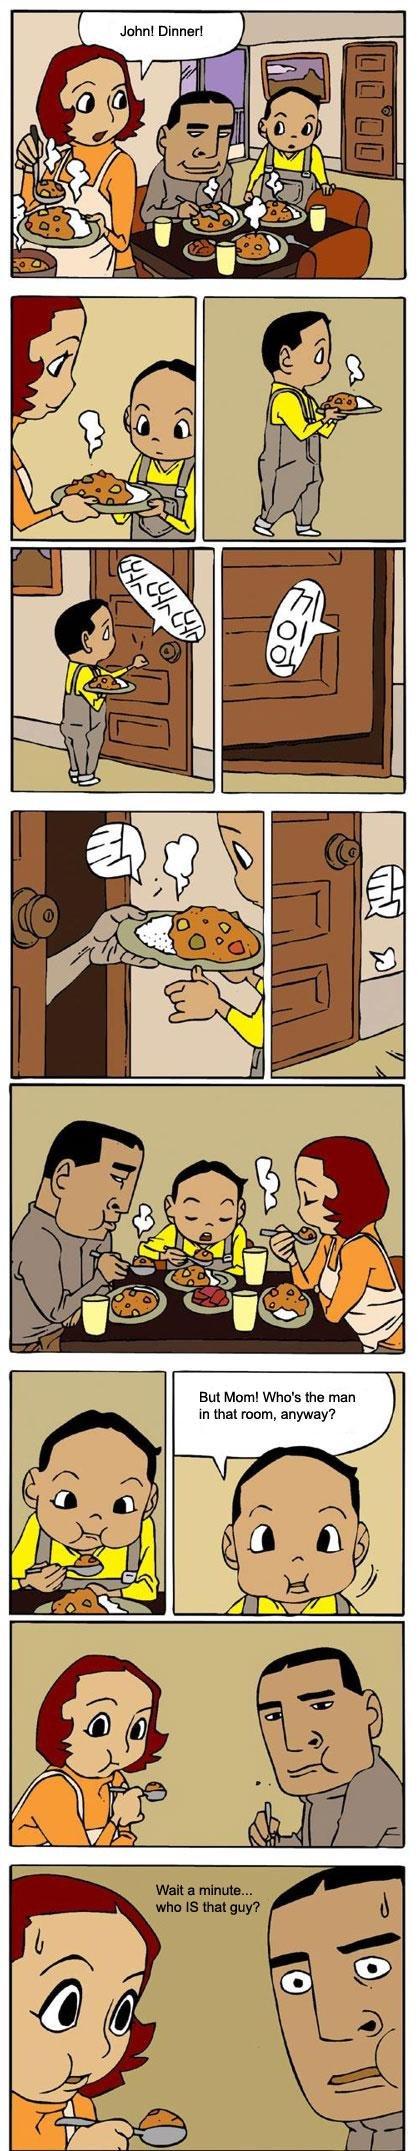 Korean Comic Strip Part 10